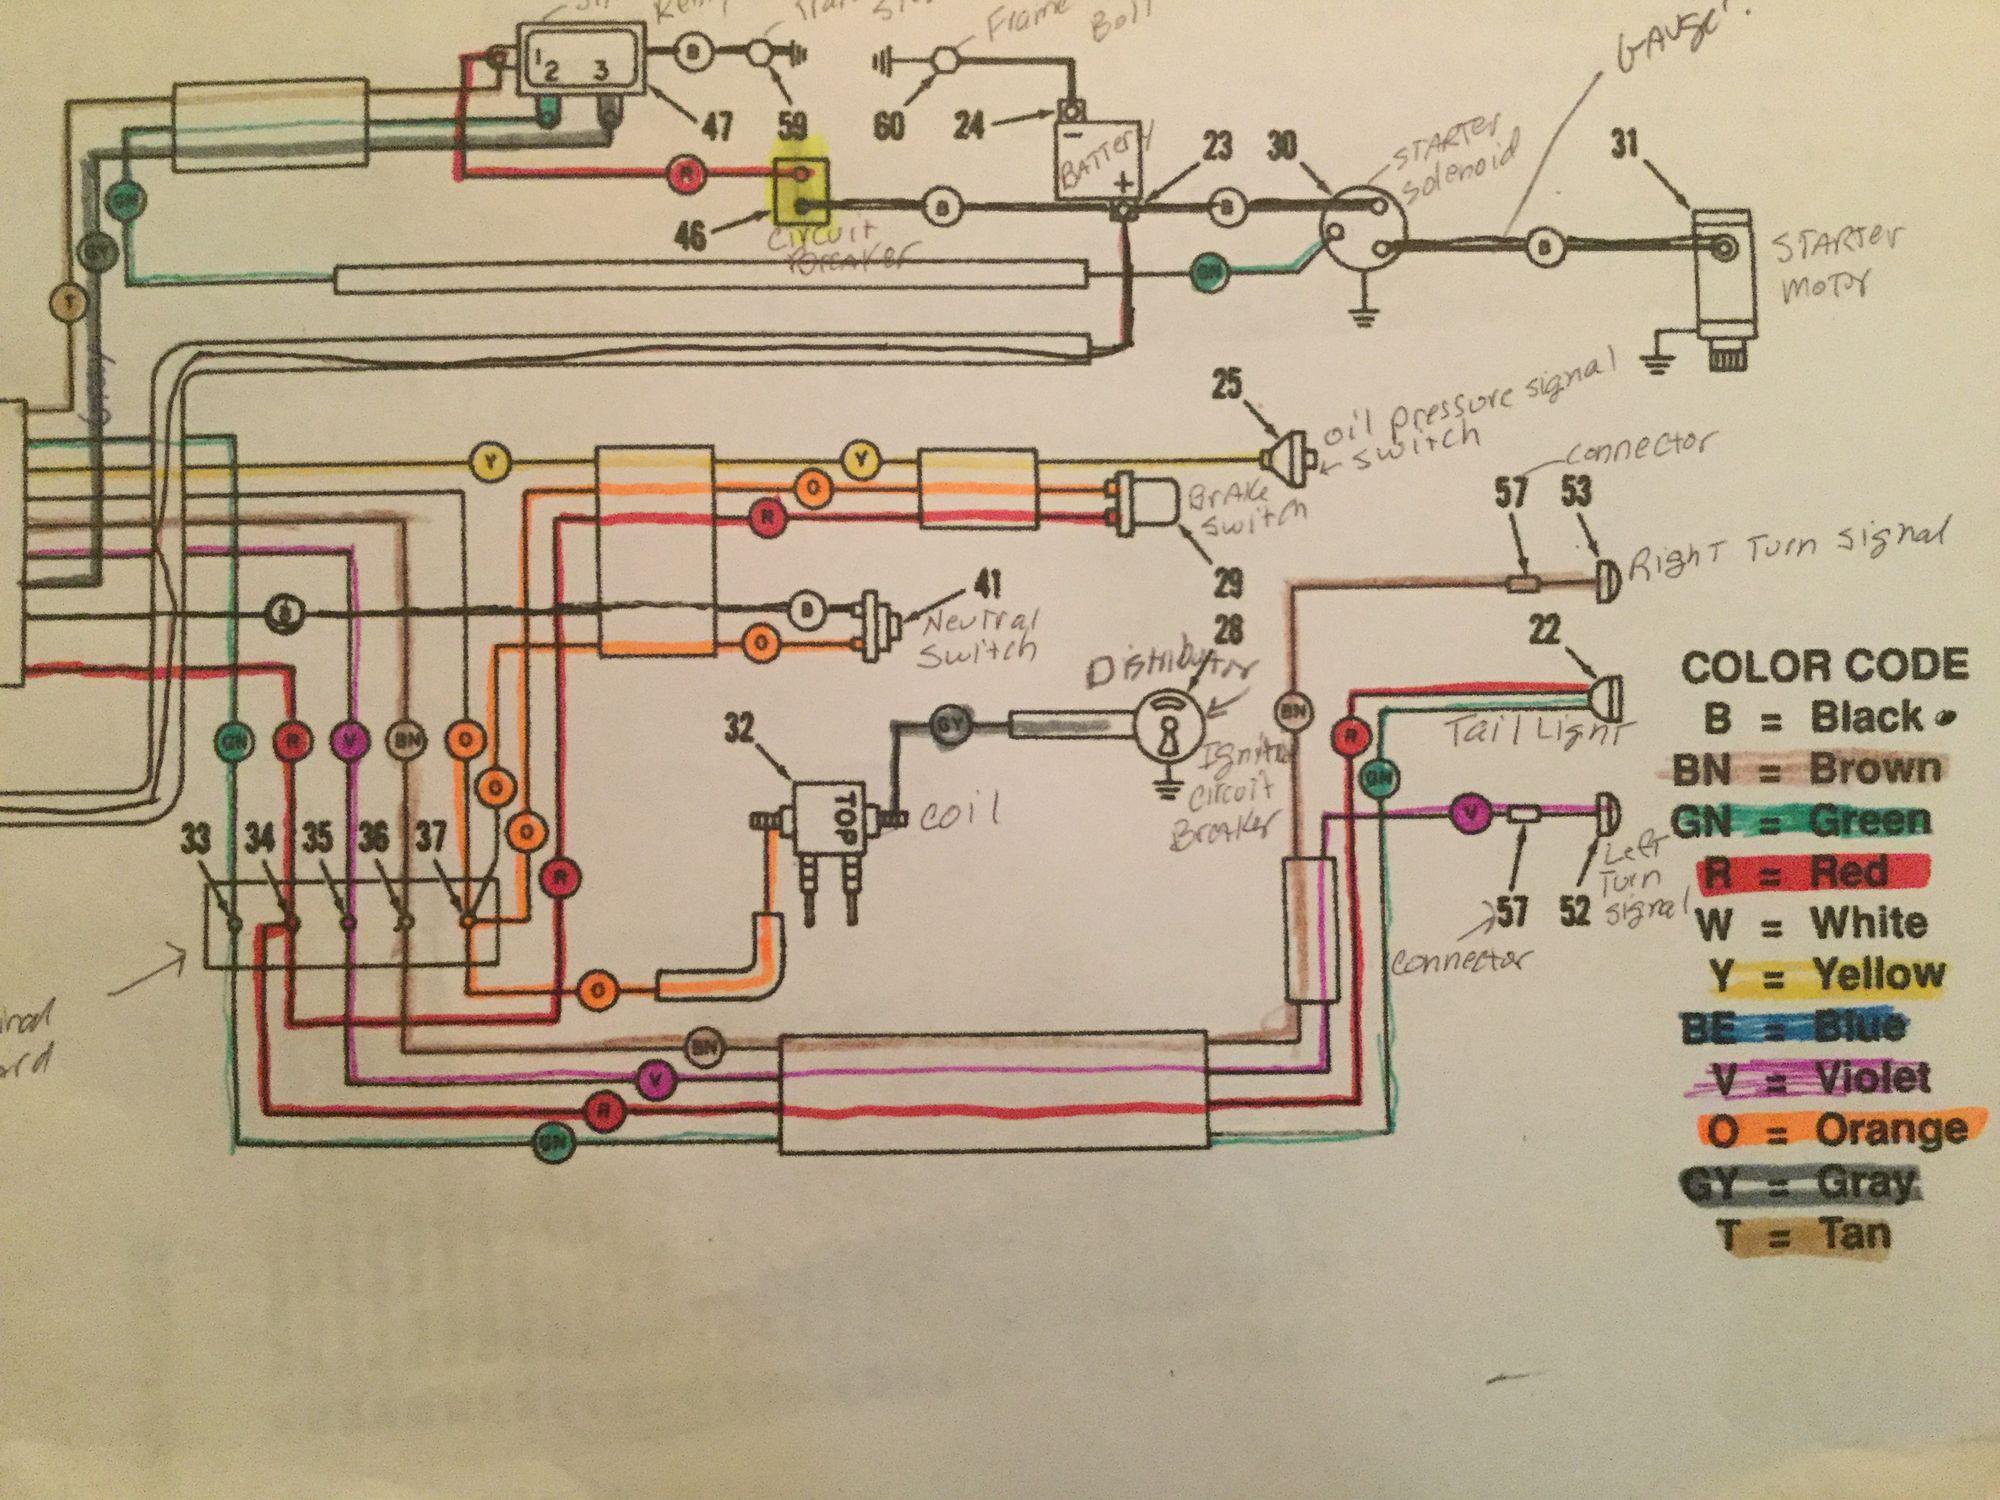 MS_1729] 1980 Harley Davidson Flh Wiring Diagram Schematic WiringPschts Anist Icand Sospe Xrenket Estep Mopar Lectu Stap Scata Kapemie  Mohammedshrine Librar Wiring 101